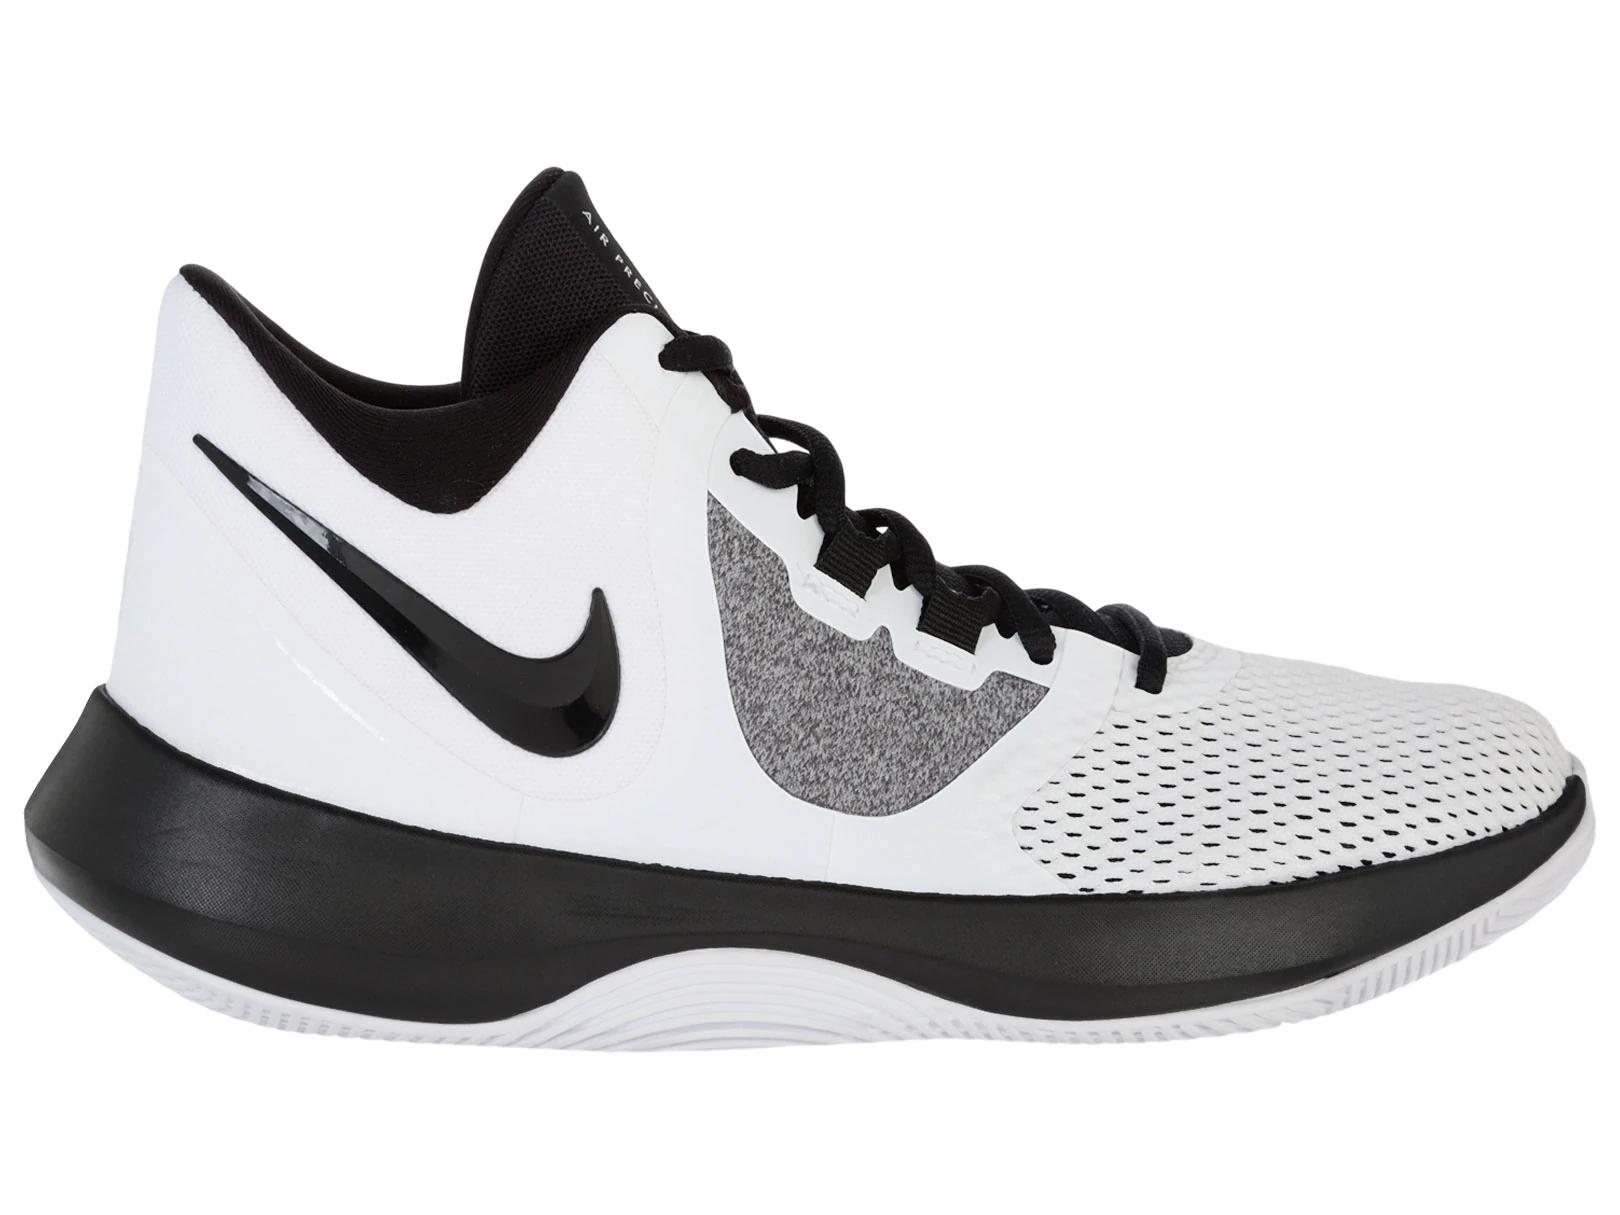 Liverpool Tenis Nike Basquetbol 27 cm